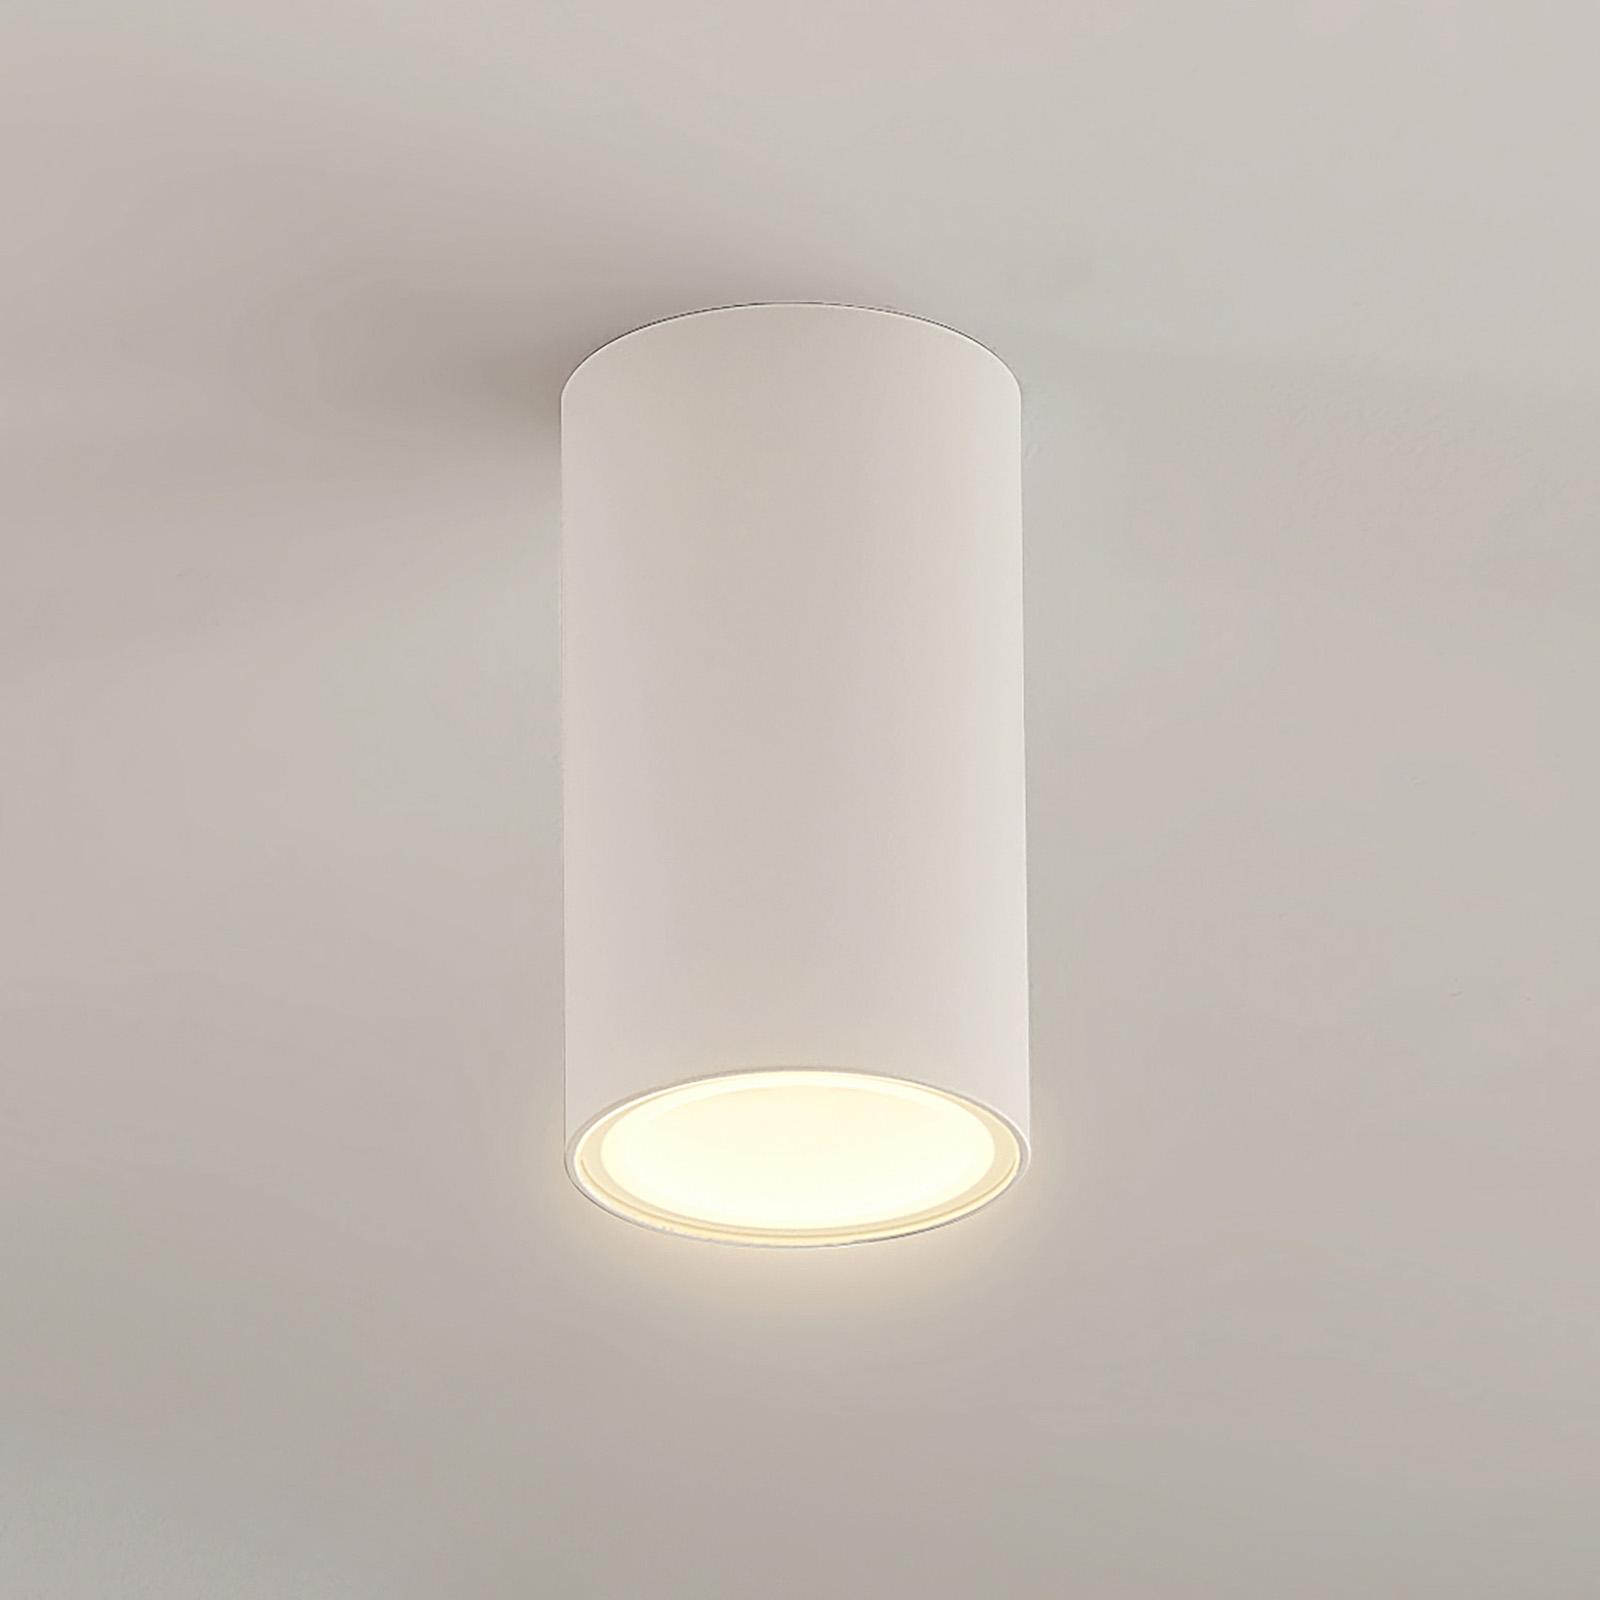 Arcchio Olivir downlight, rond, GU10, blanc